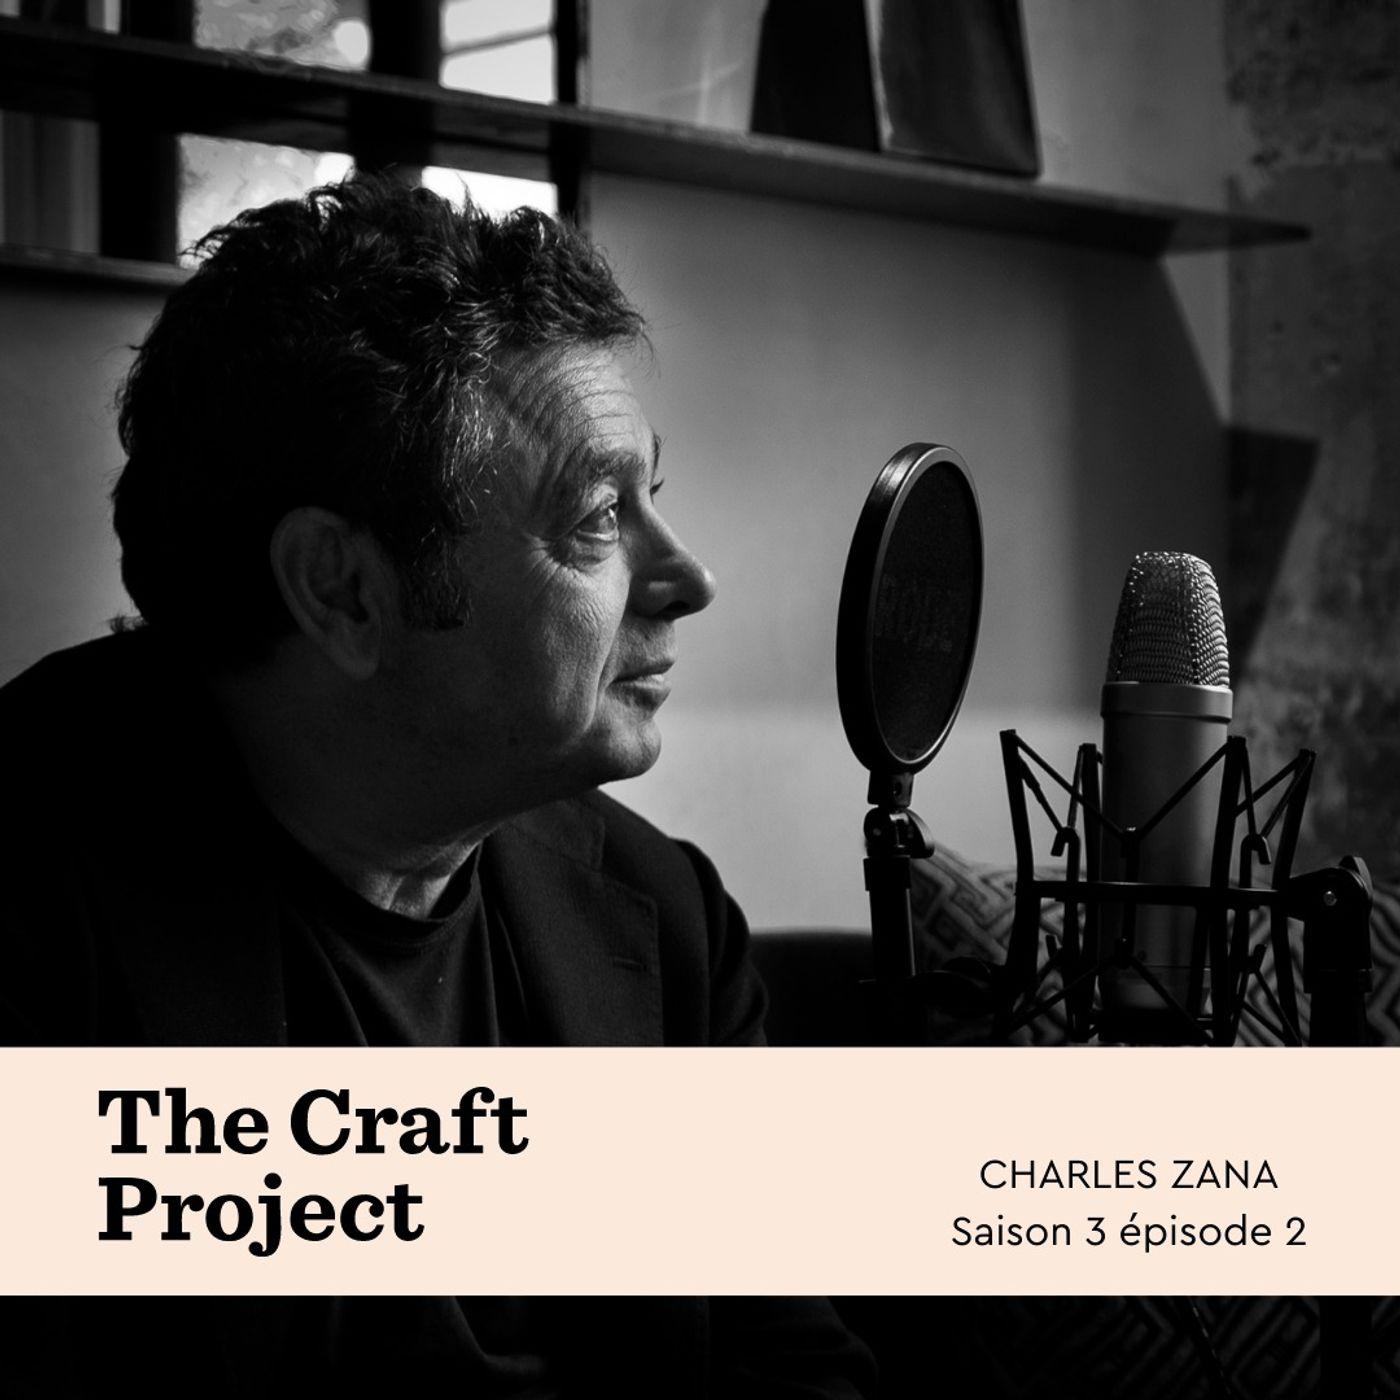 Charles Zana, architecte esthète du style français